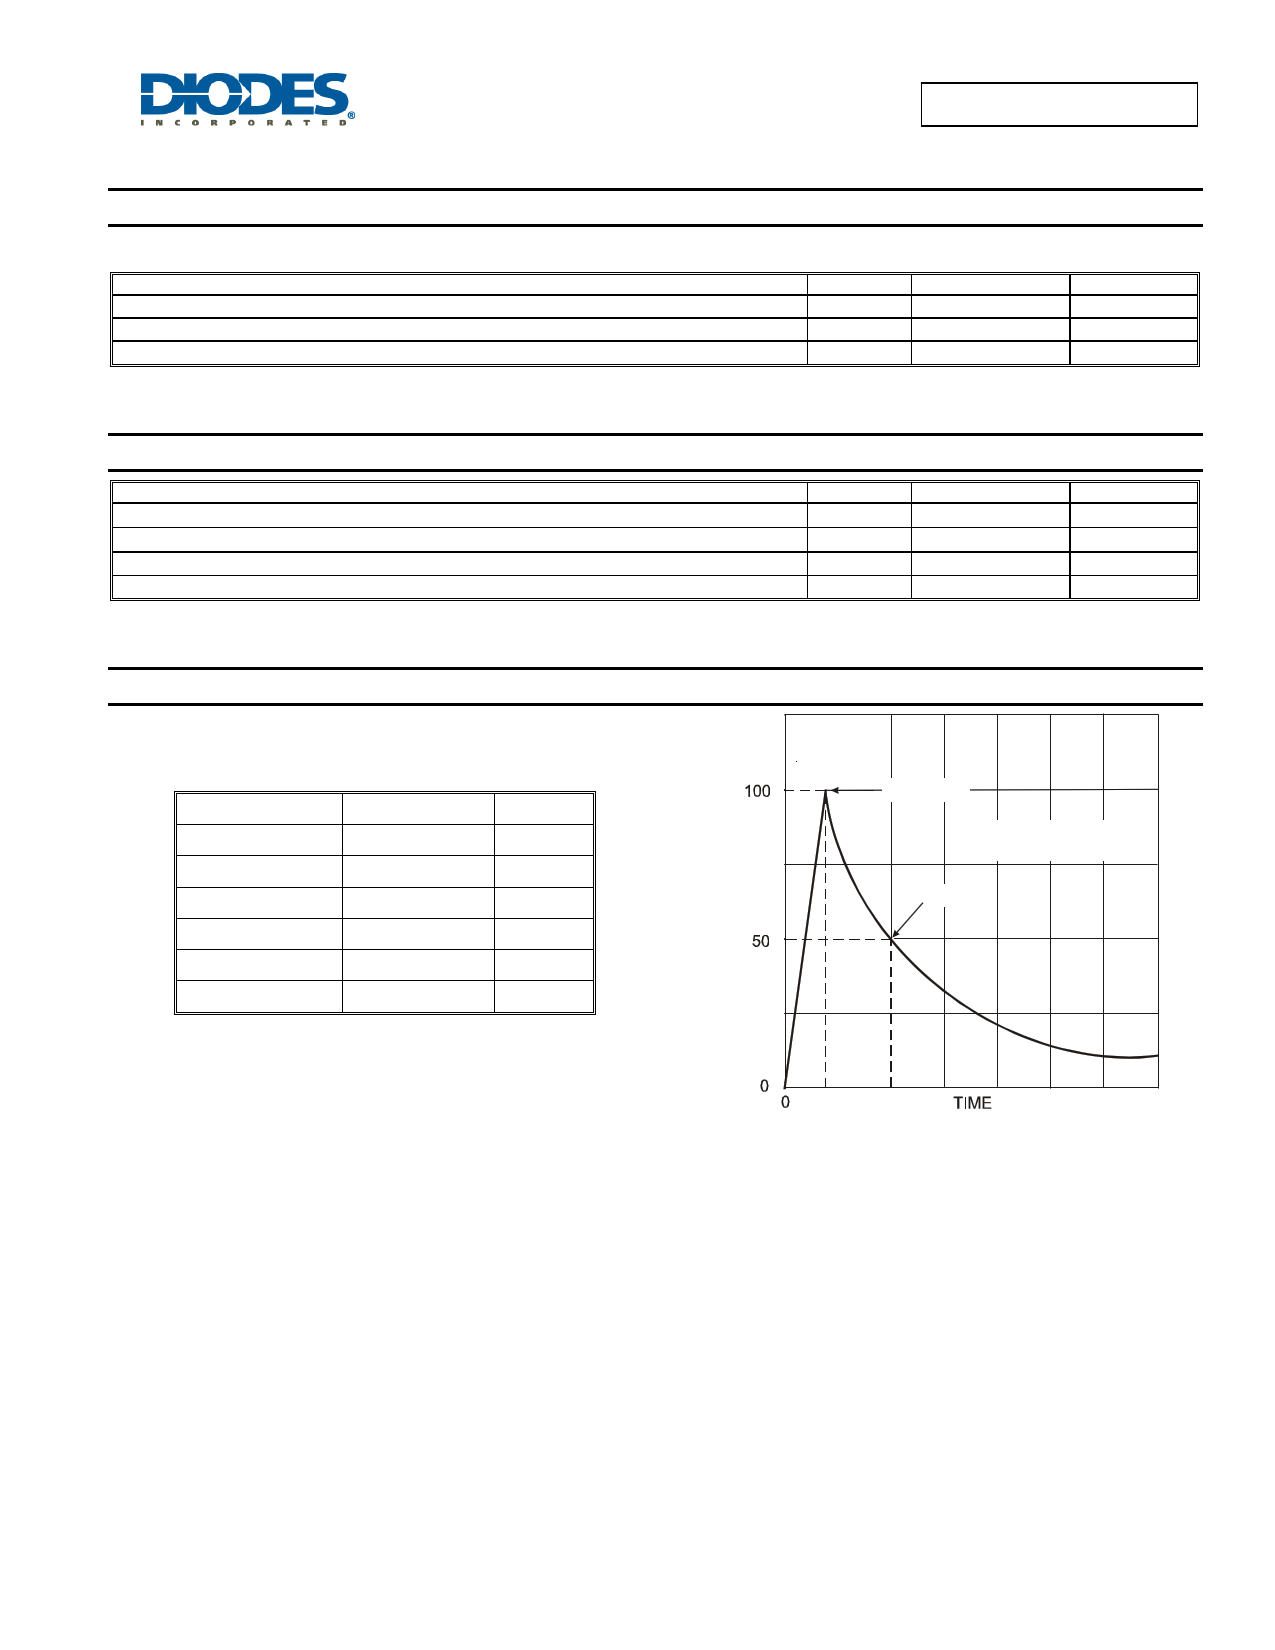 TB1800M pdf, equivalent, schematic